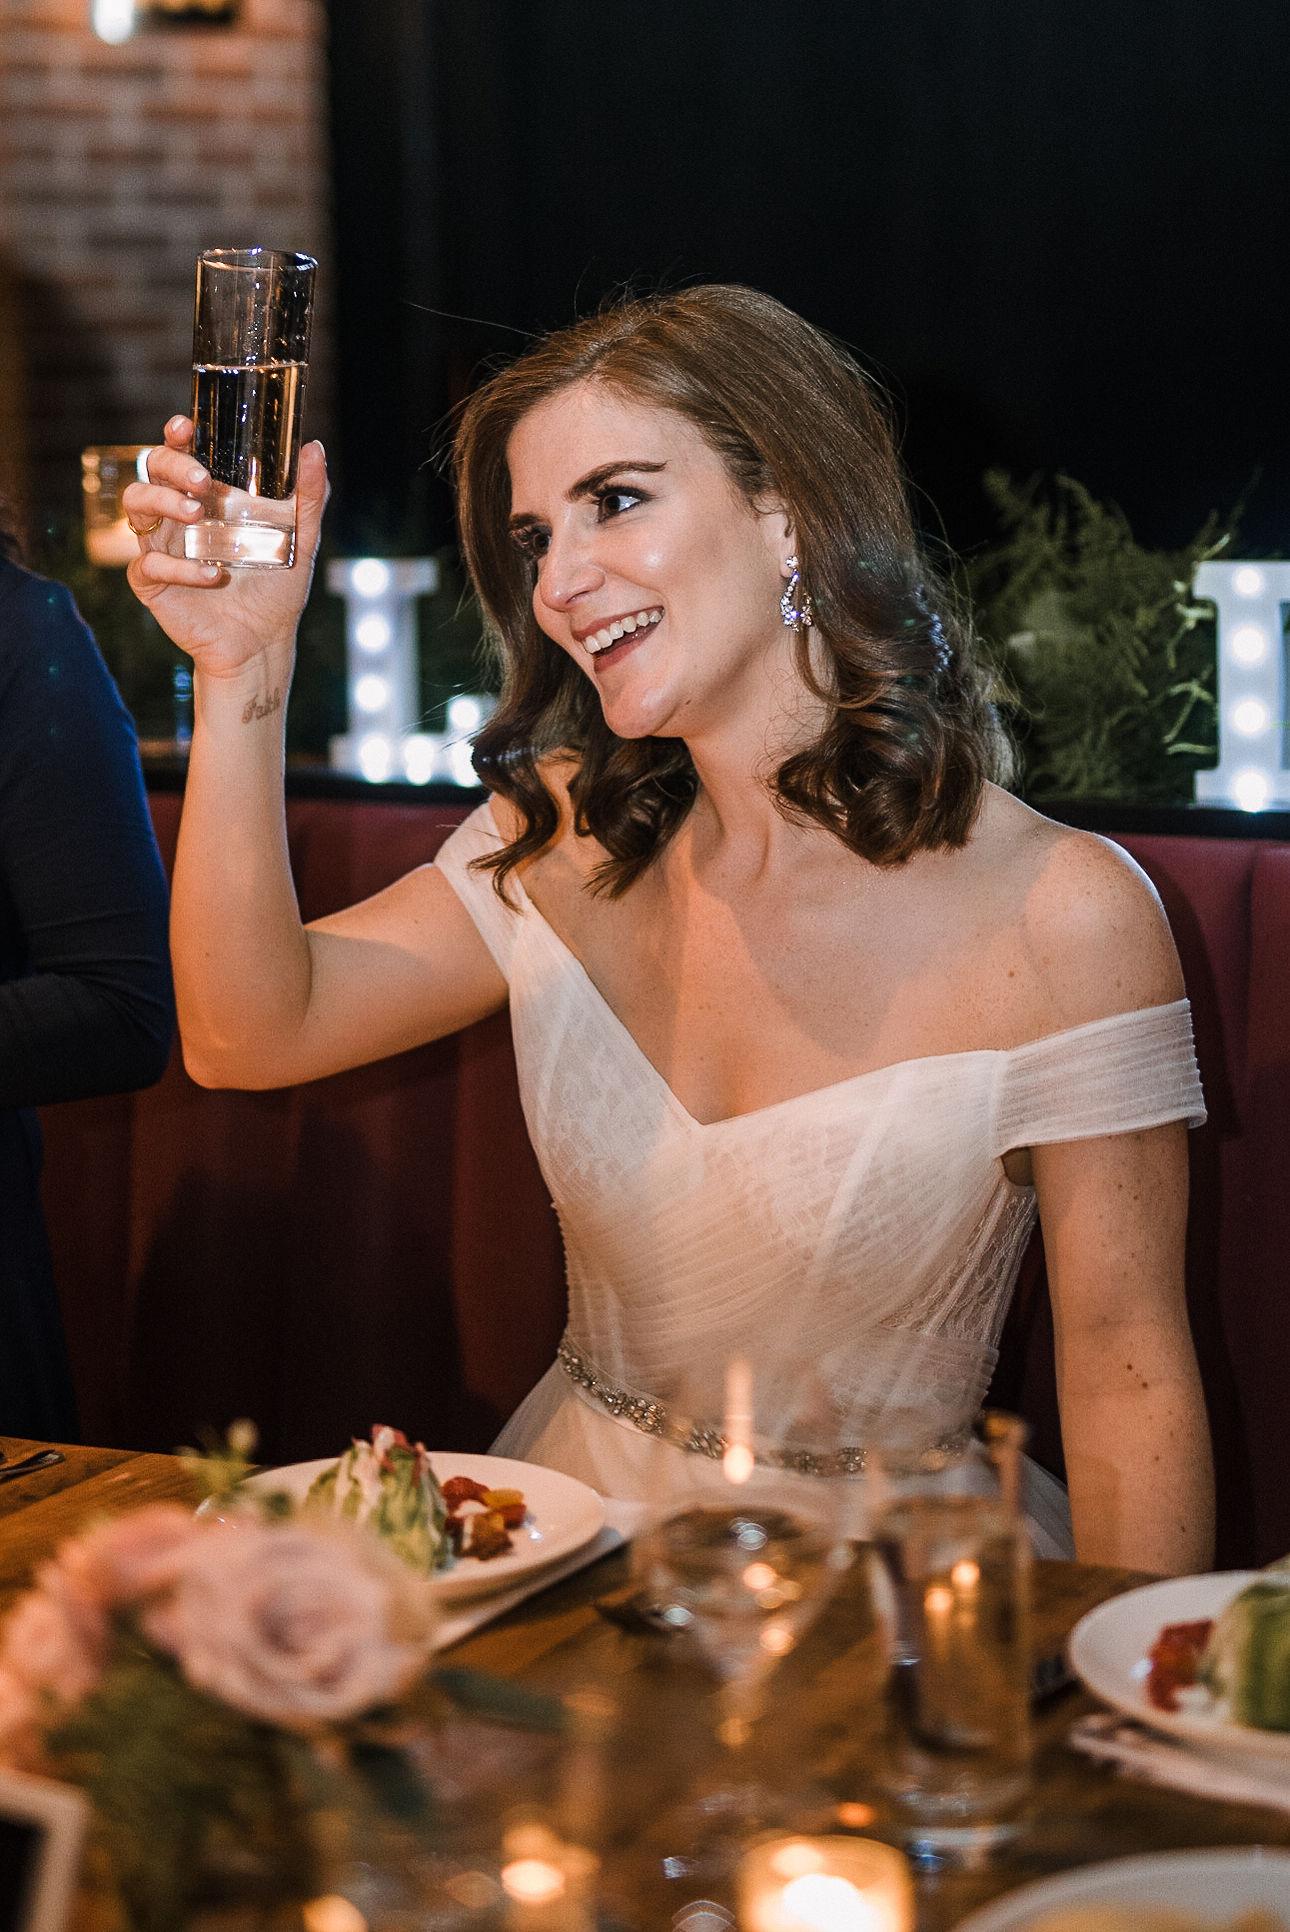 bride toasting at wedding reception at City Winery in Washington DC